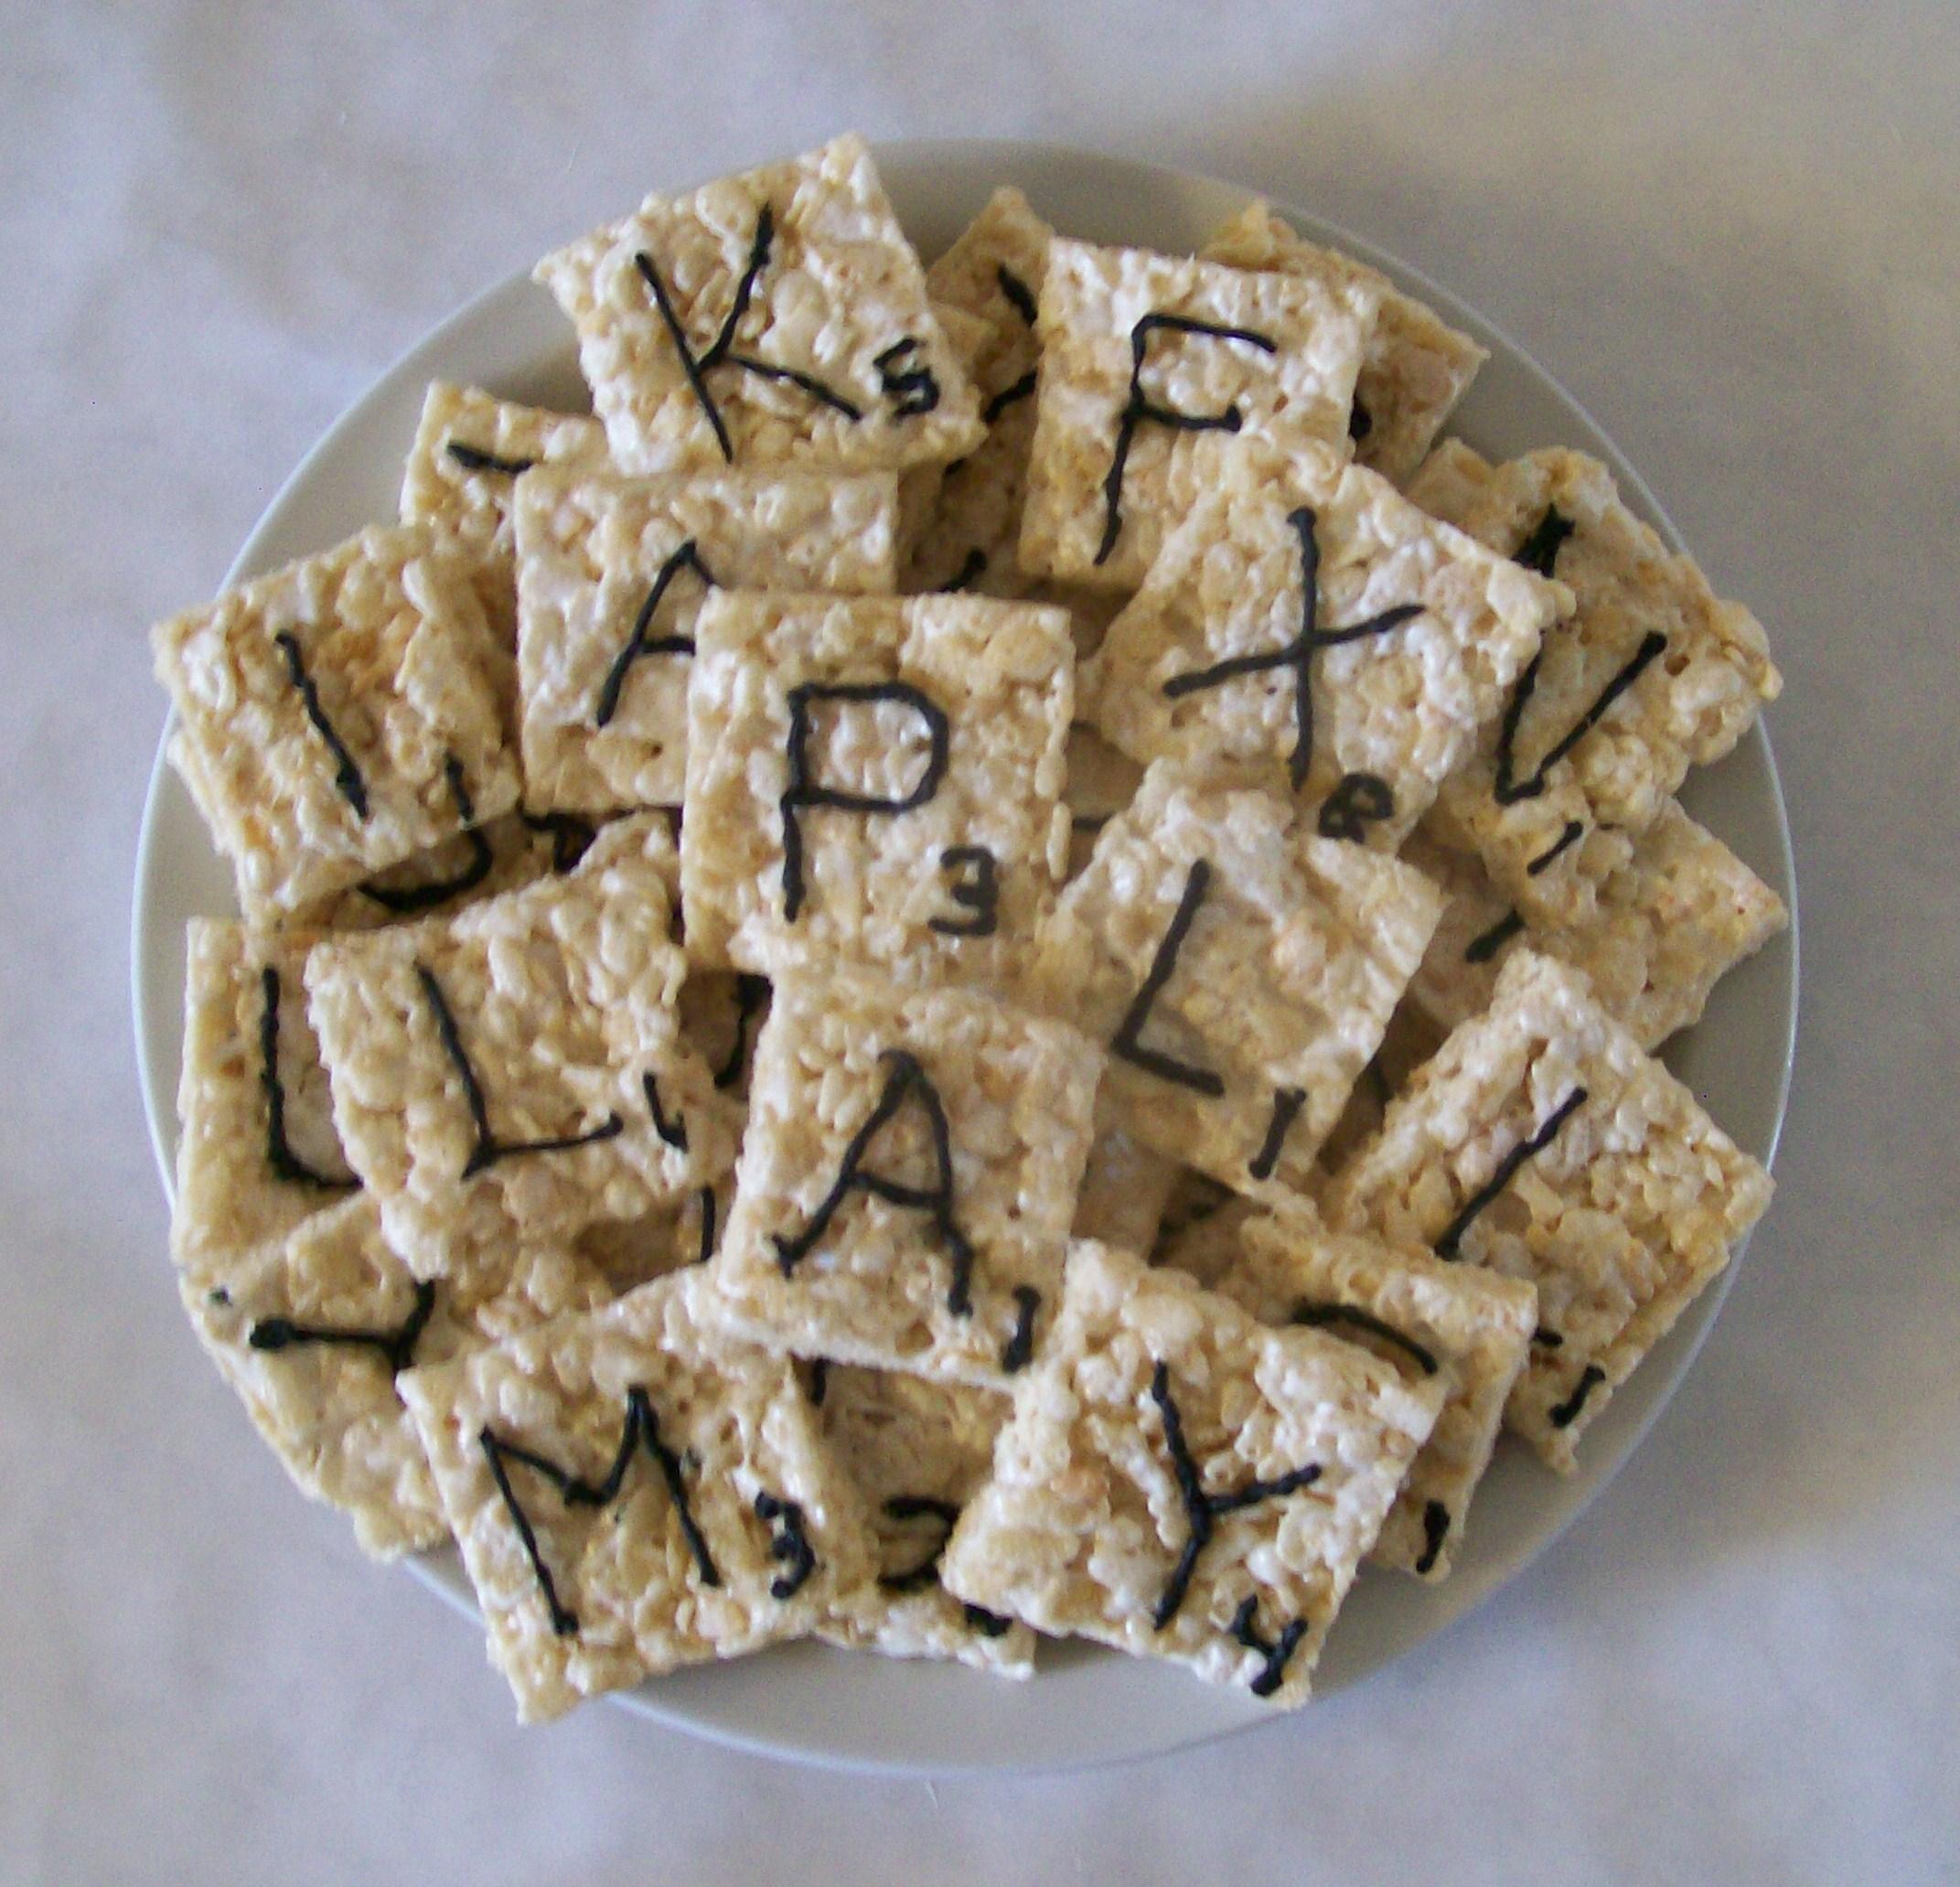 Scrabble Bites